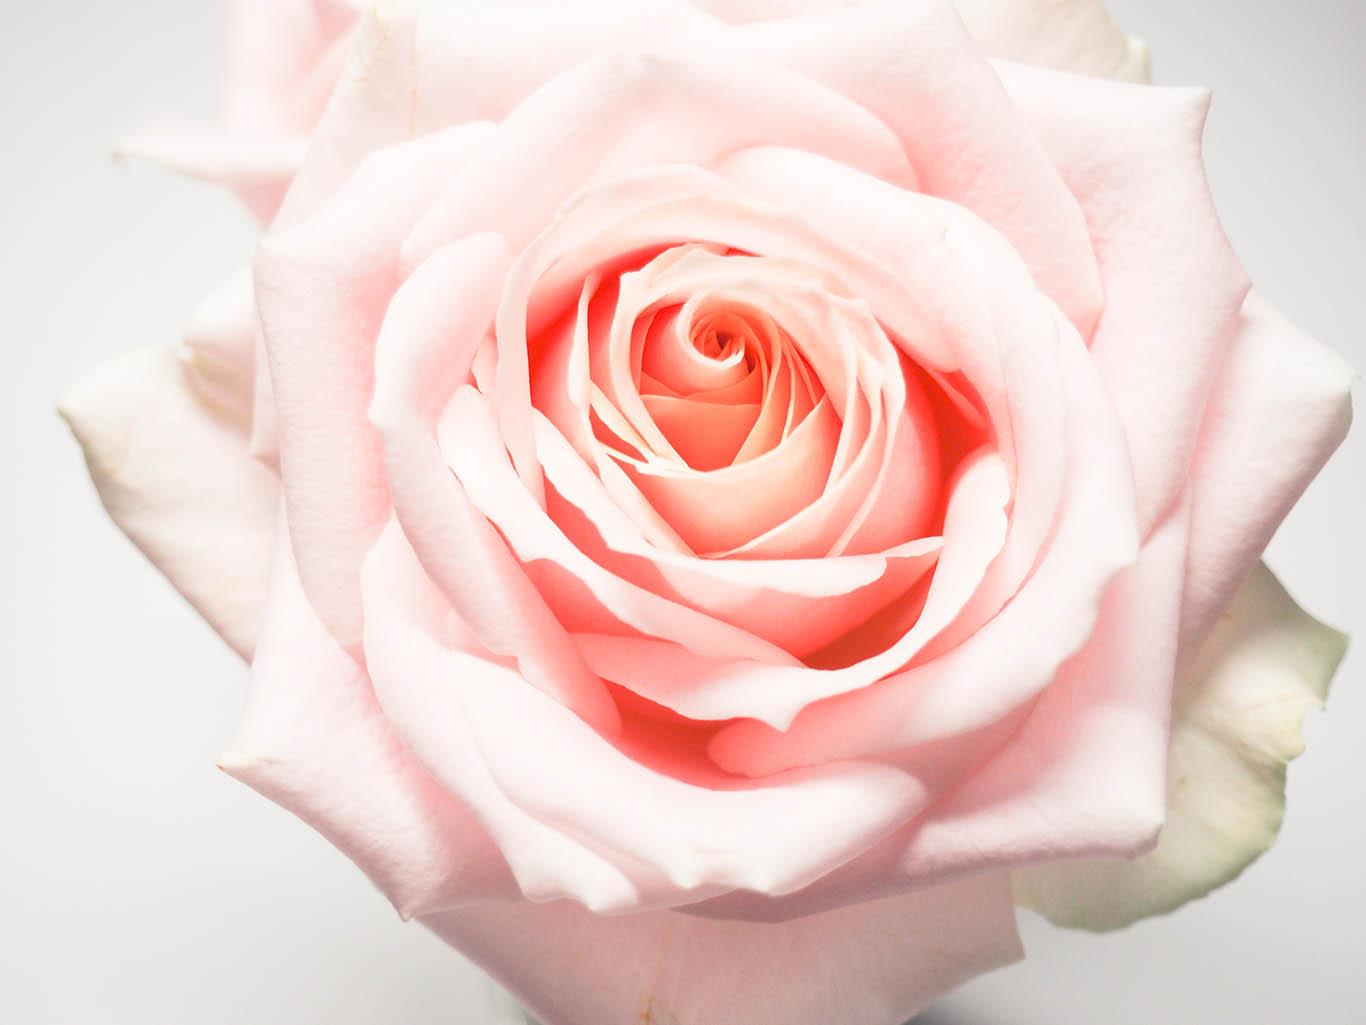 free stock photography designed by jess - Pink Rose Macro.jpg